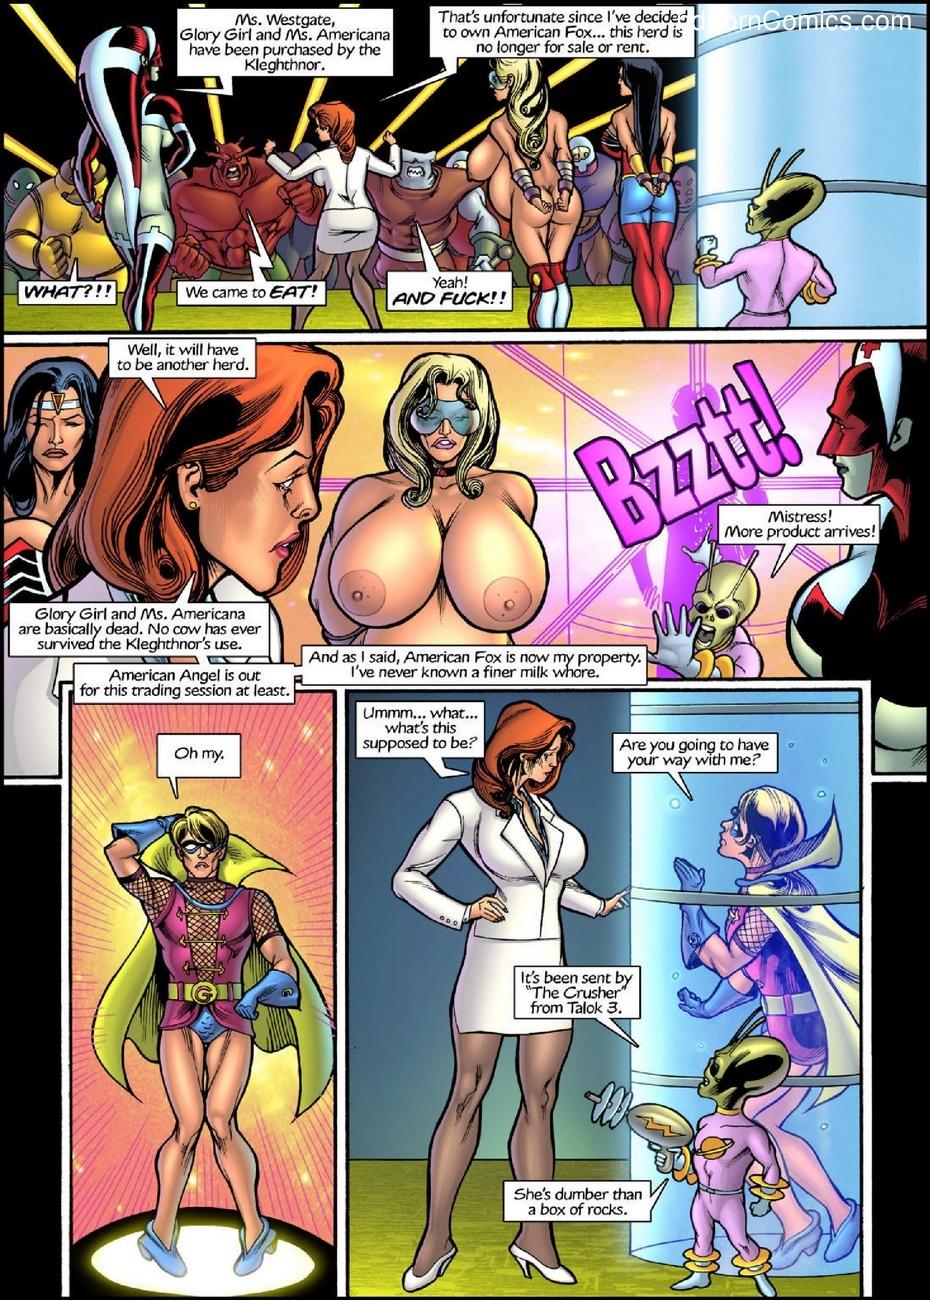 Freedom Stars - Cattle Call 1 48 free sex comic